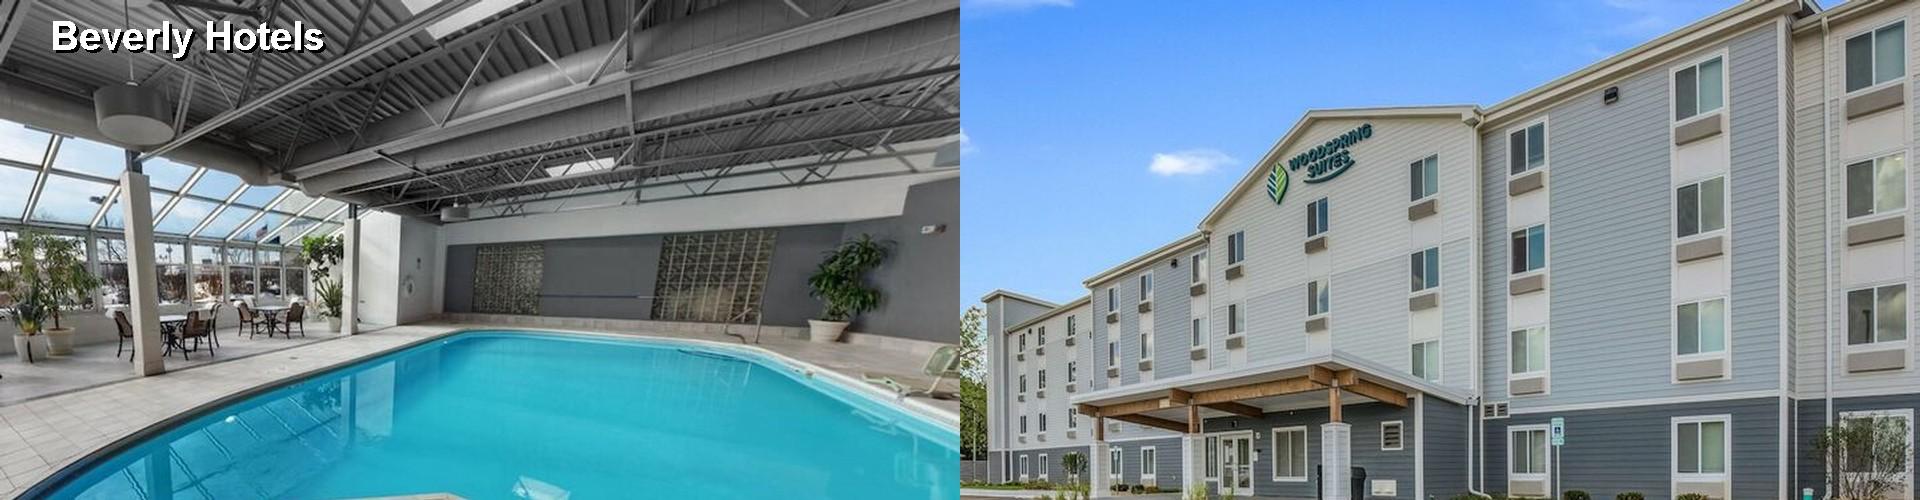 5 Best Hotels Near Beverly